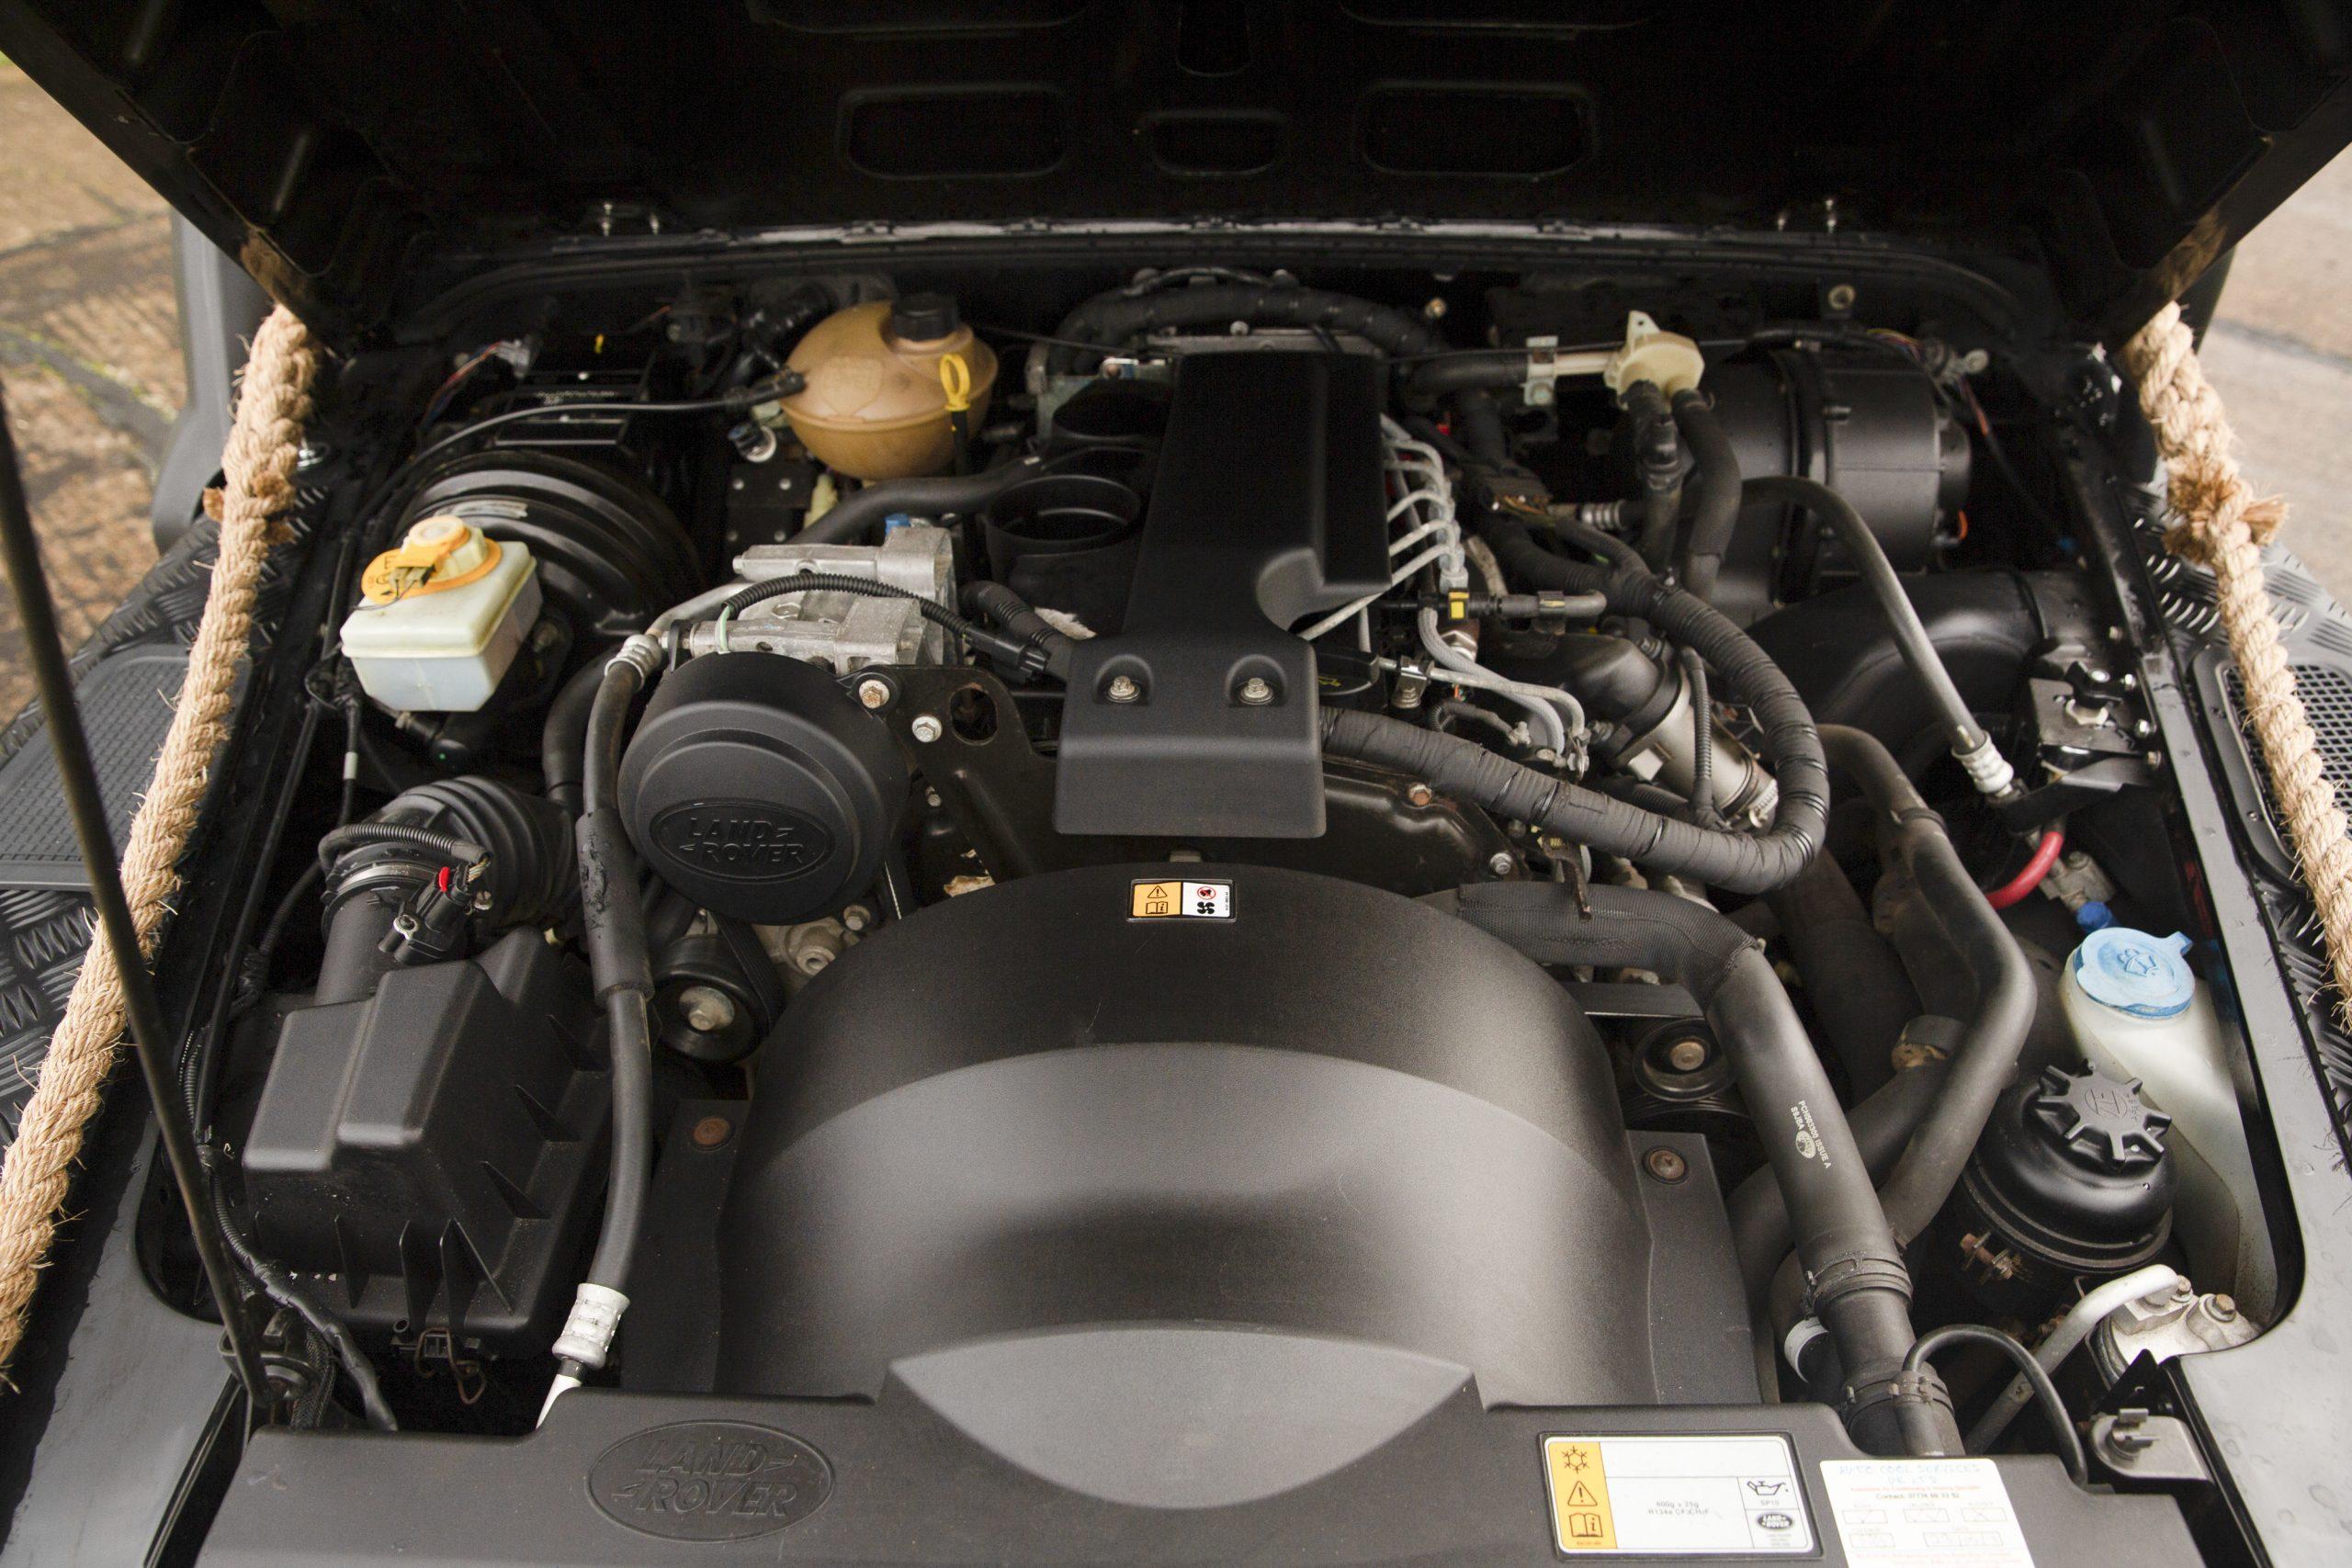 Land Rover Defender SVX Spectre engine